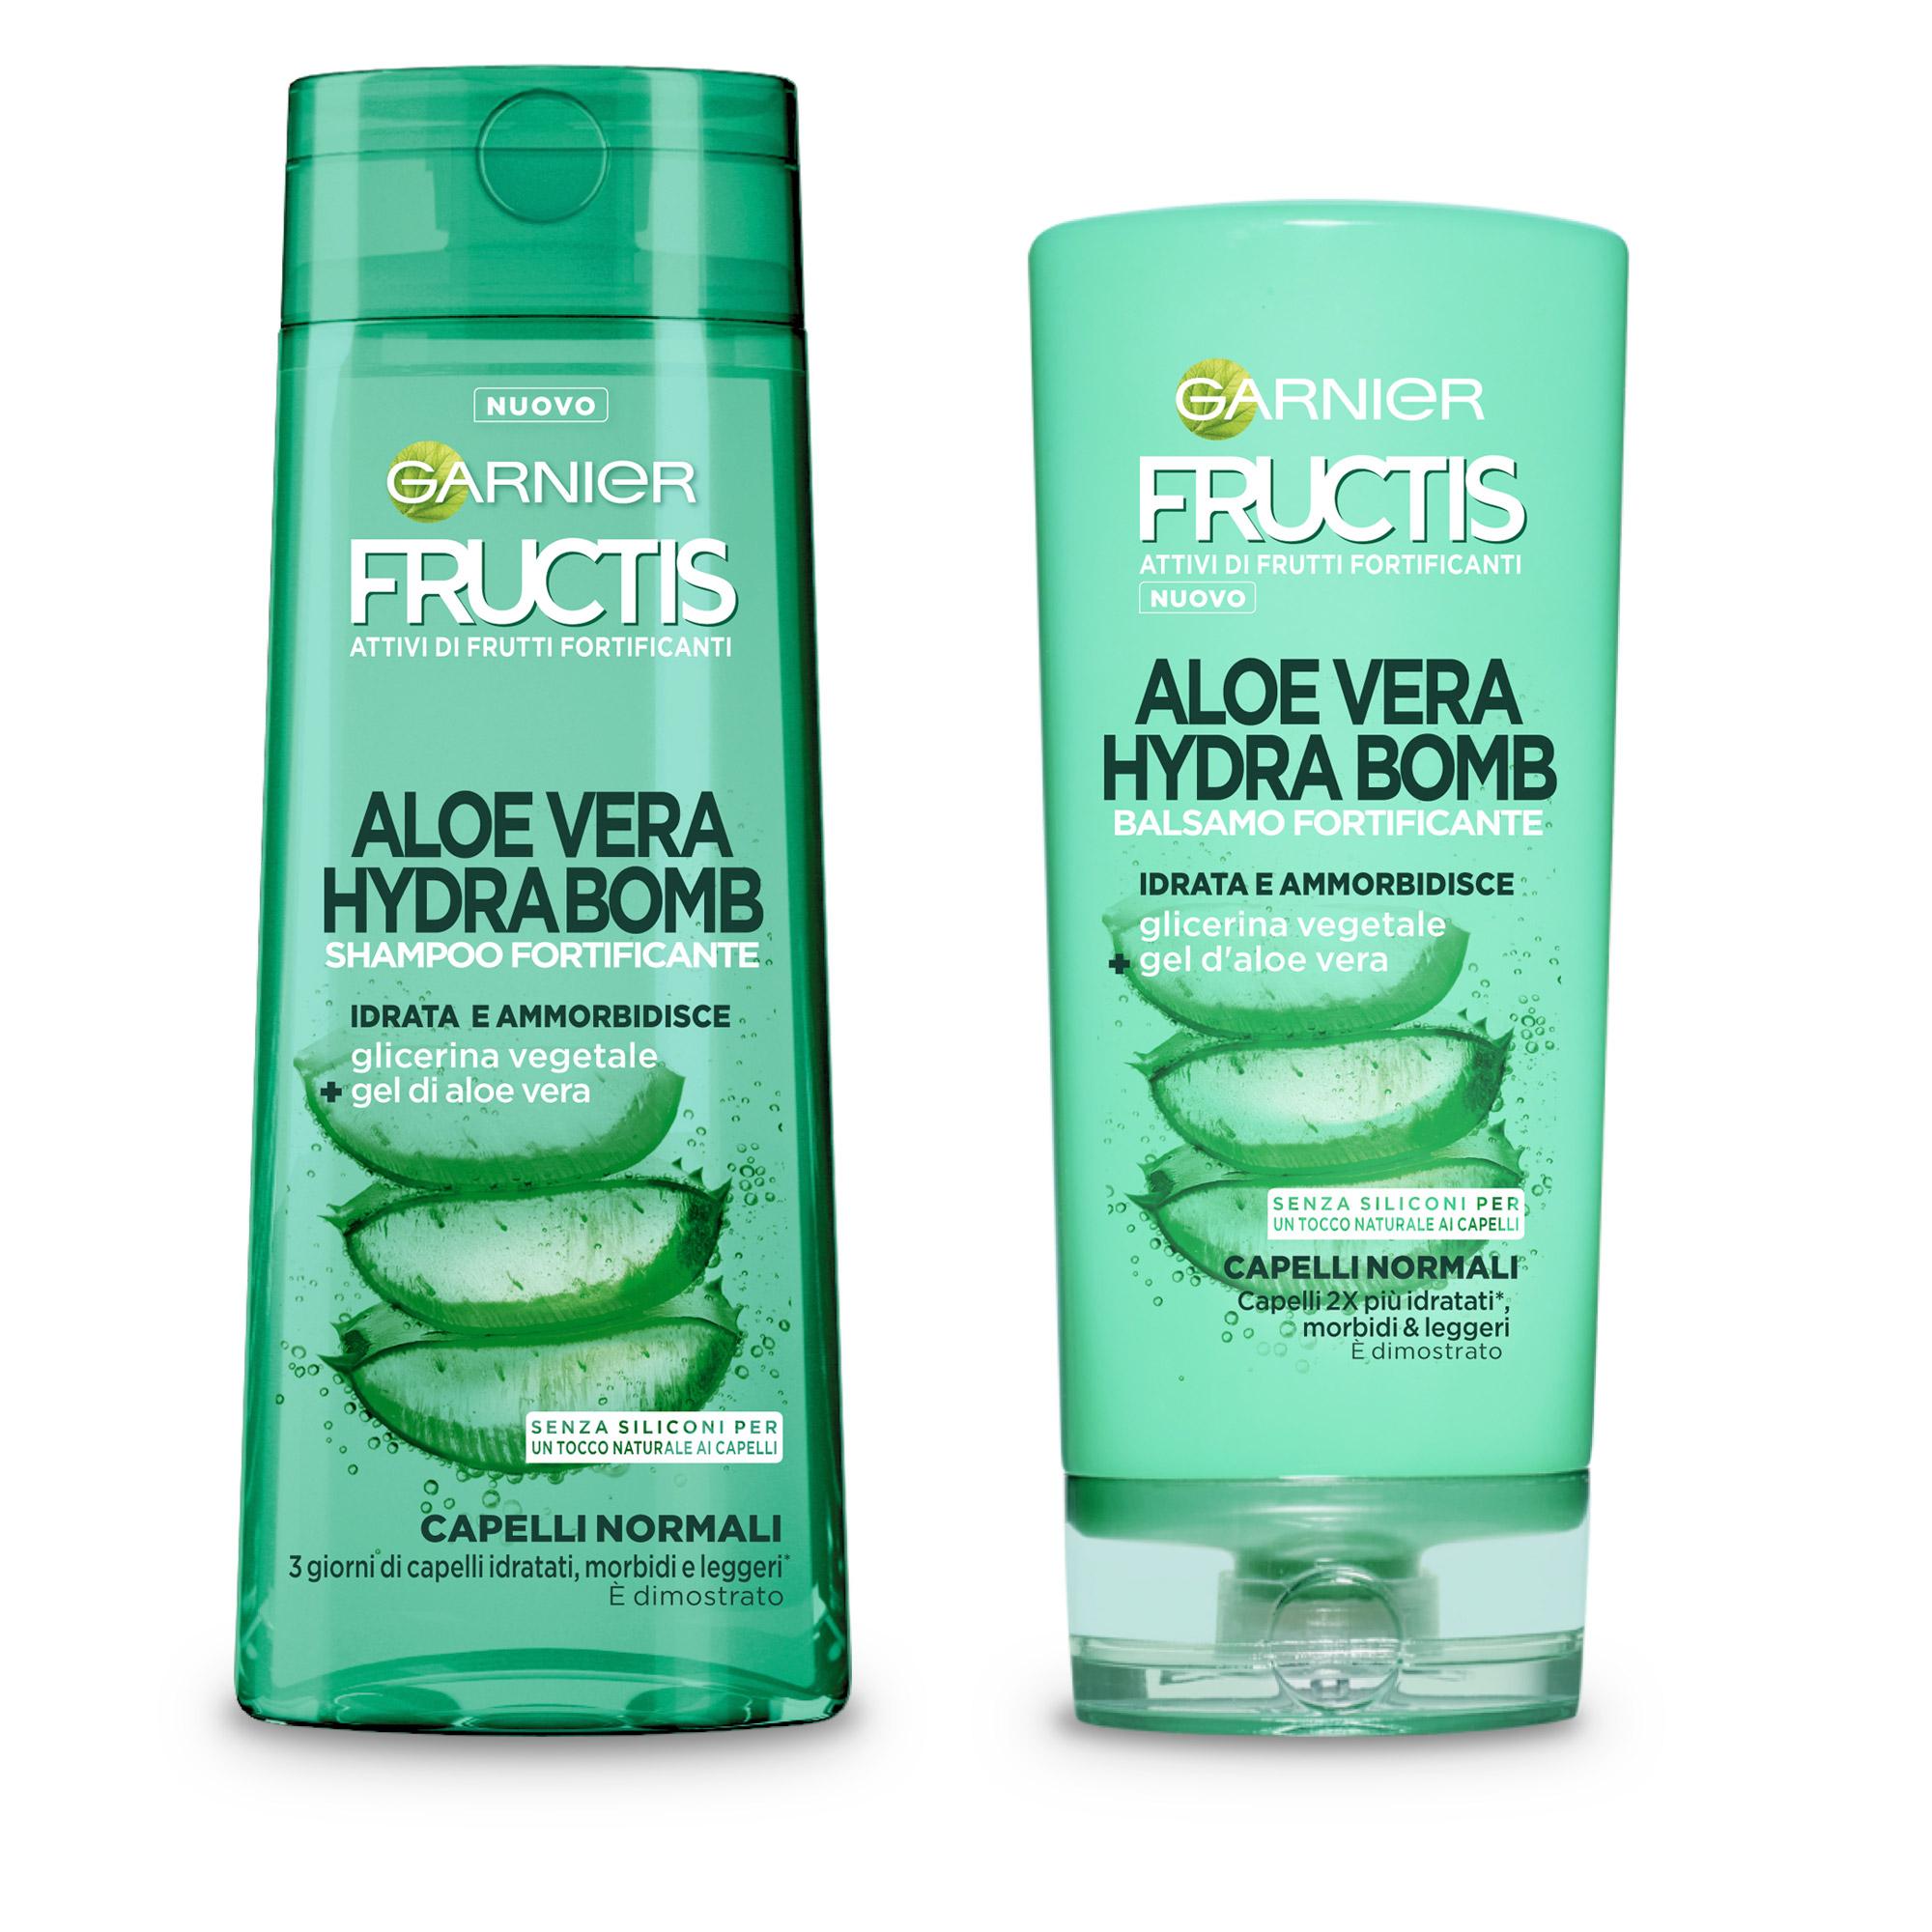 fructis-prodotti1